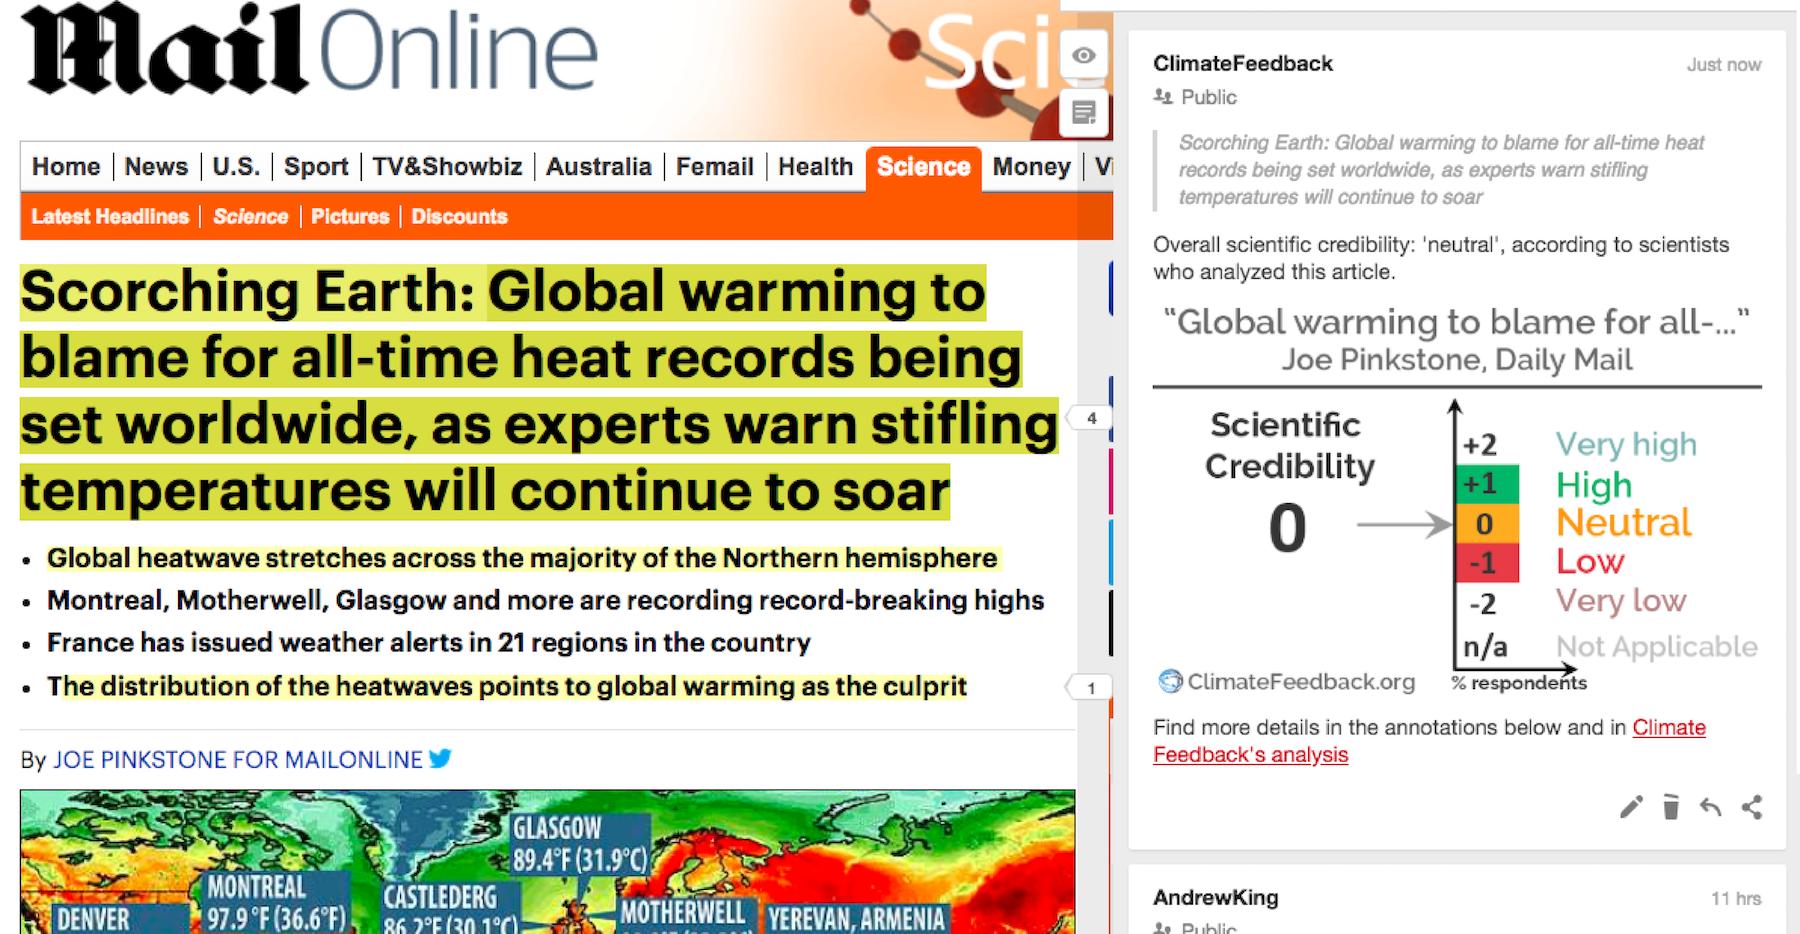 2018 Climate Feedback 27